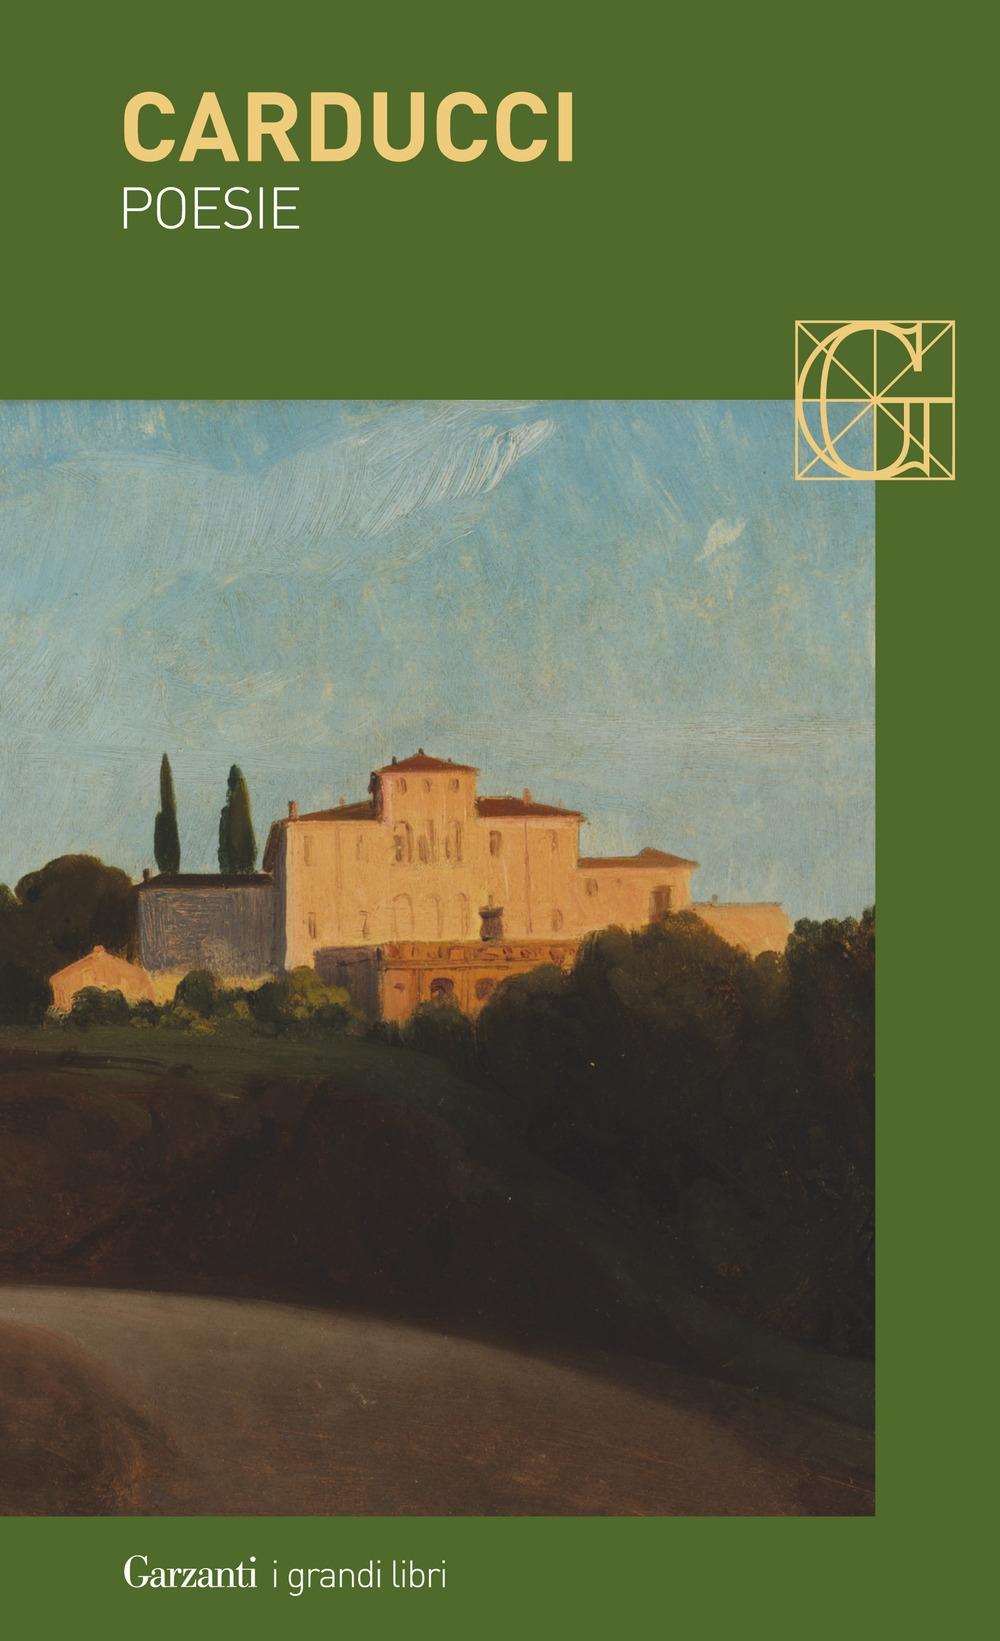 Poesie - Carducci.